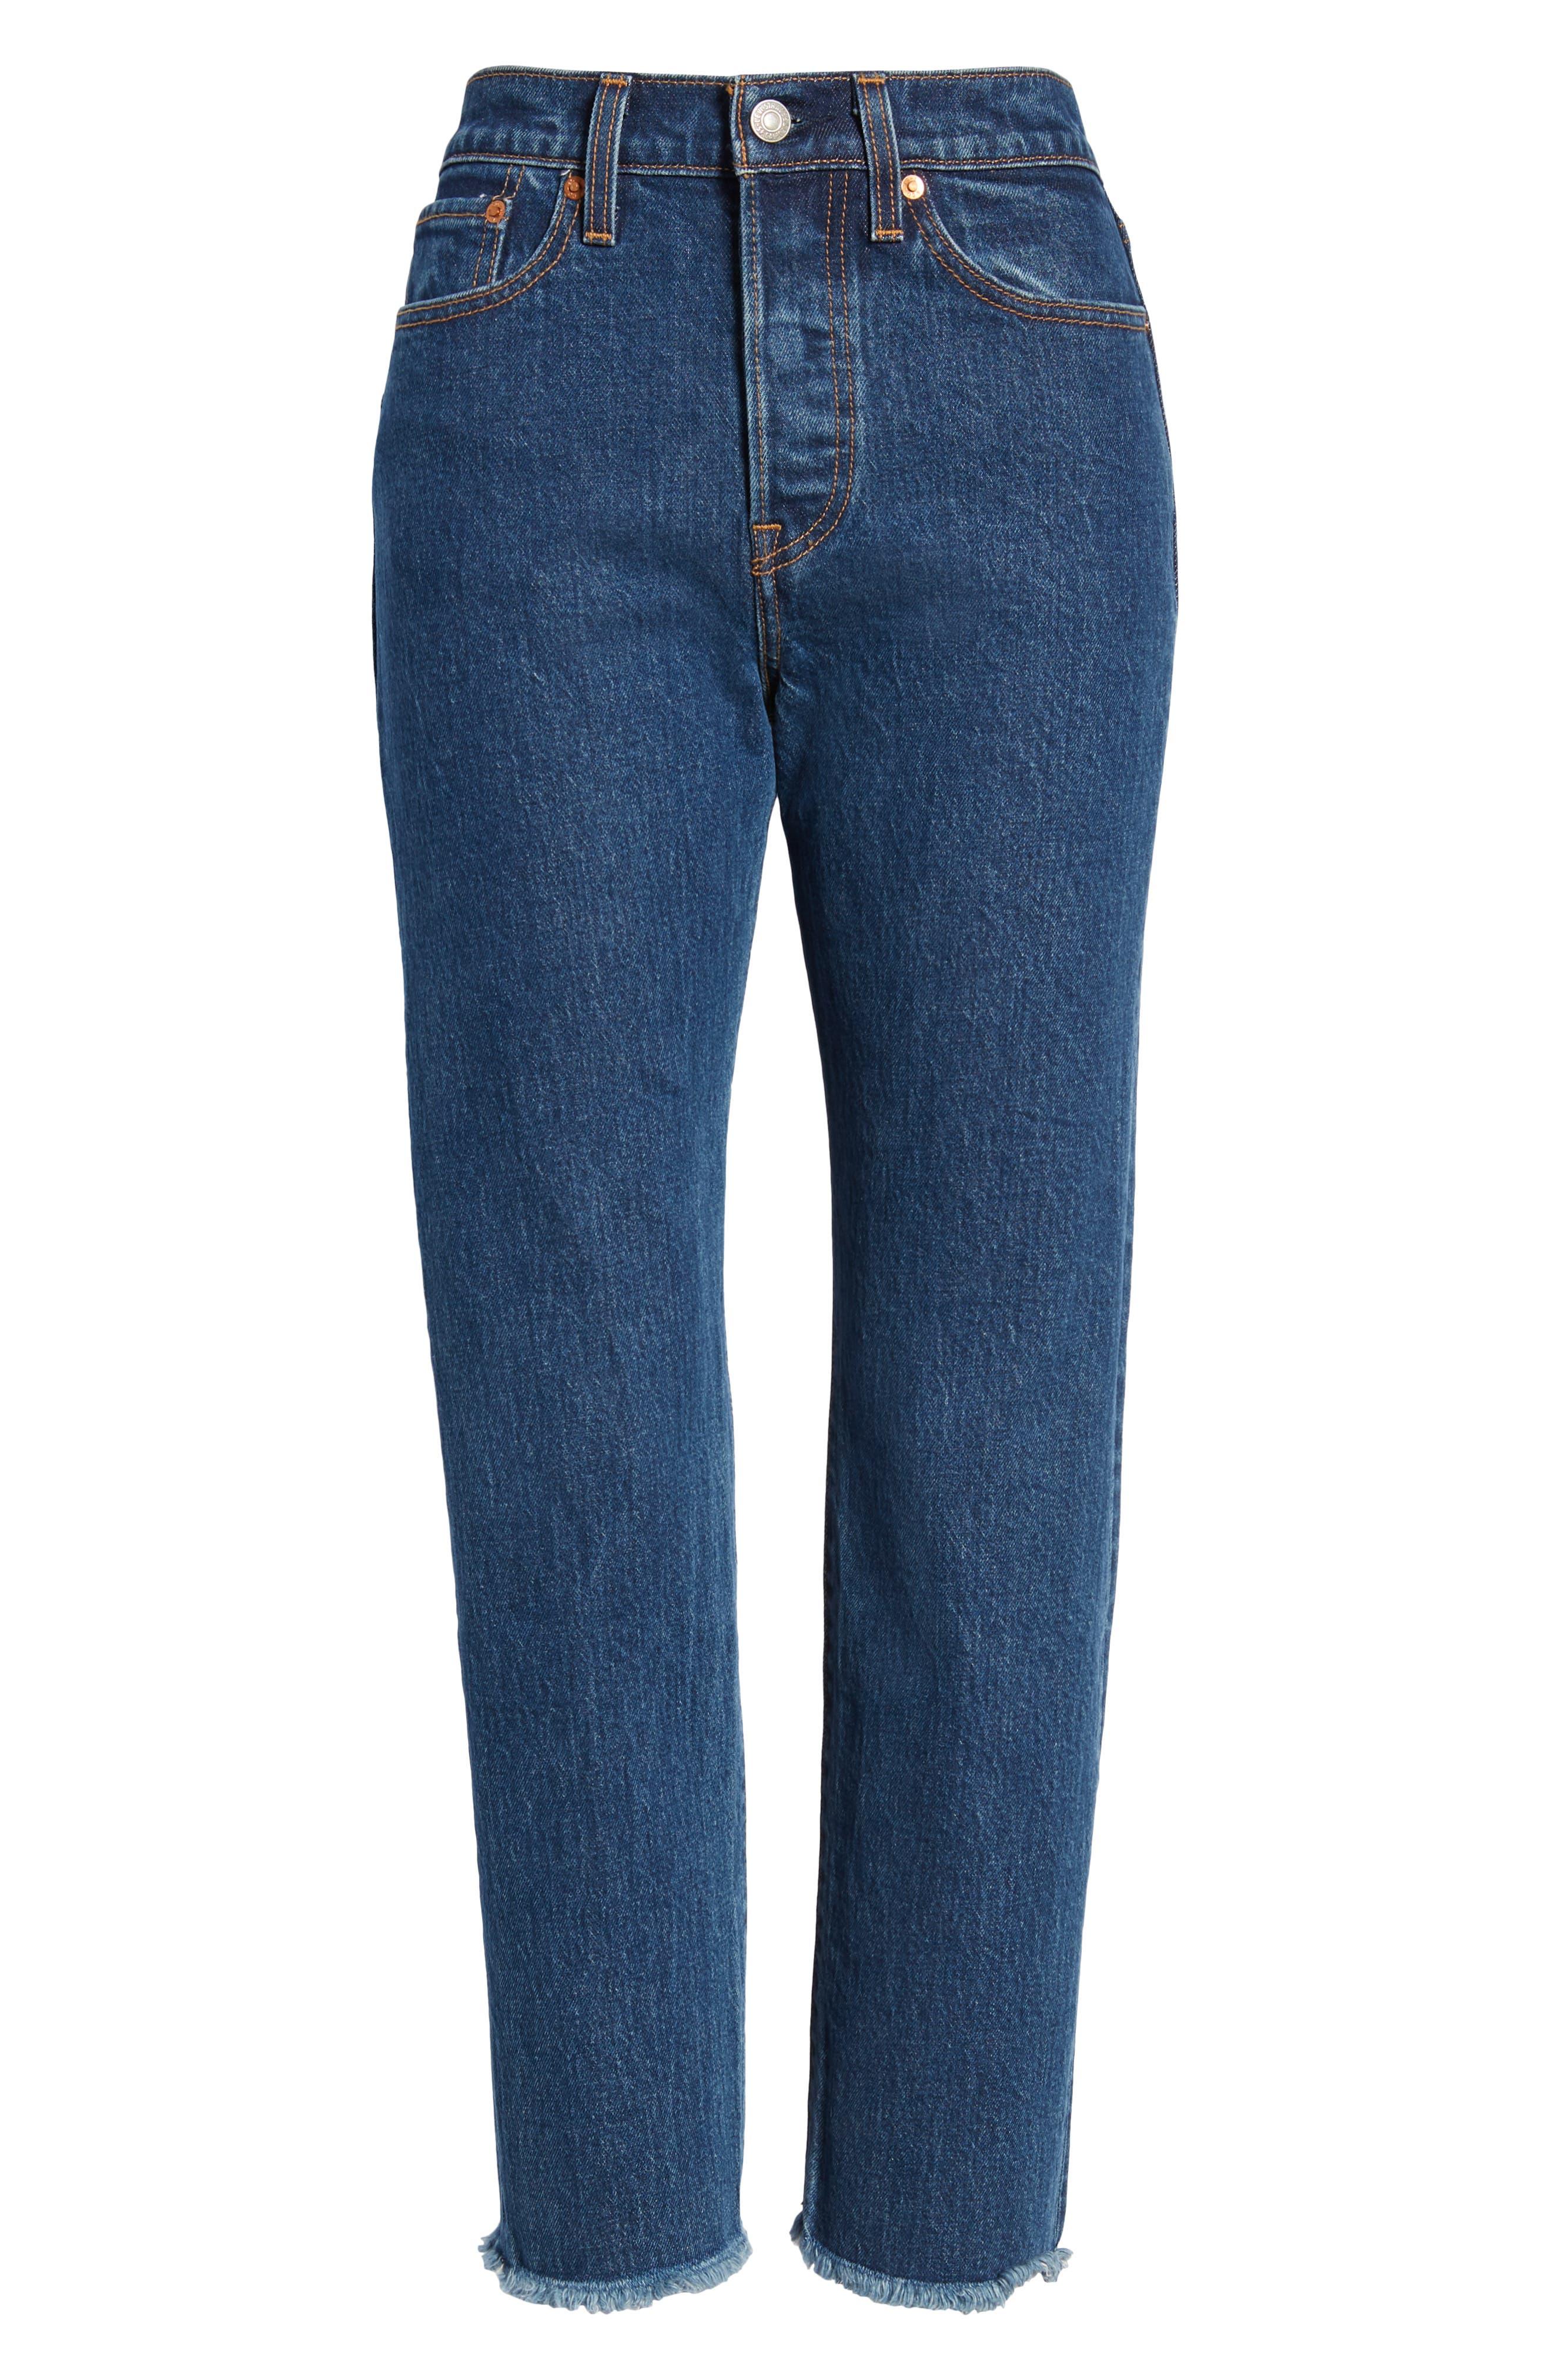 Wedgie High Waist Ankle Straight Leg Jeans,                             Alternate thumbnail 7, color,                             BELOW THE BELT